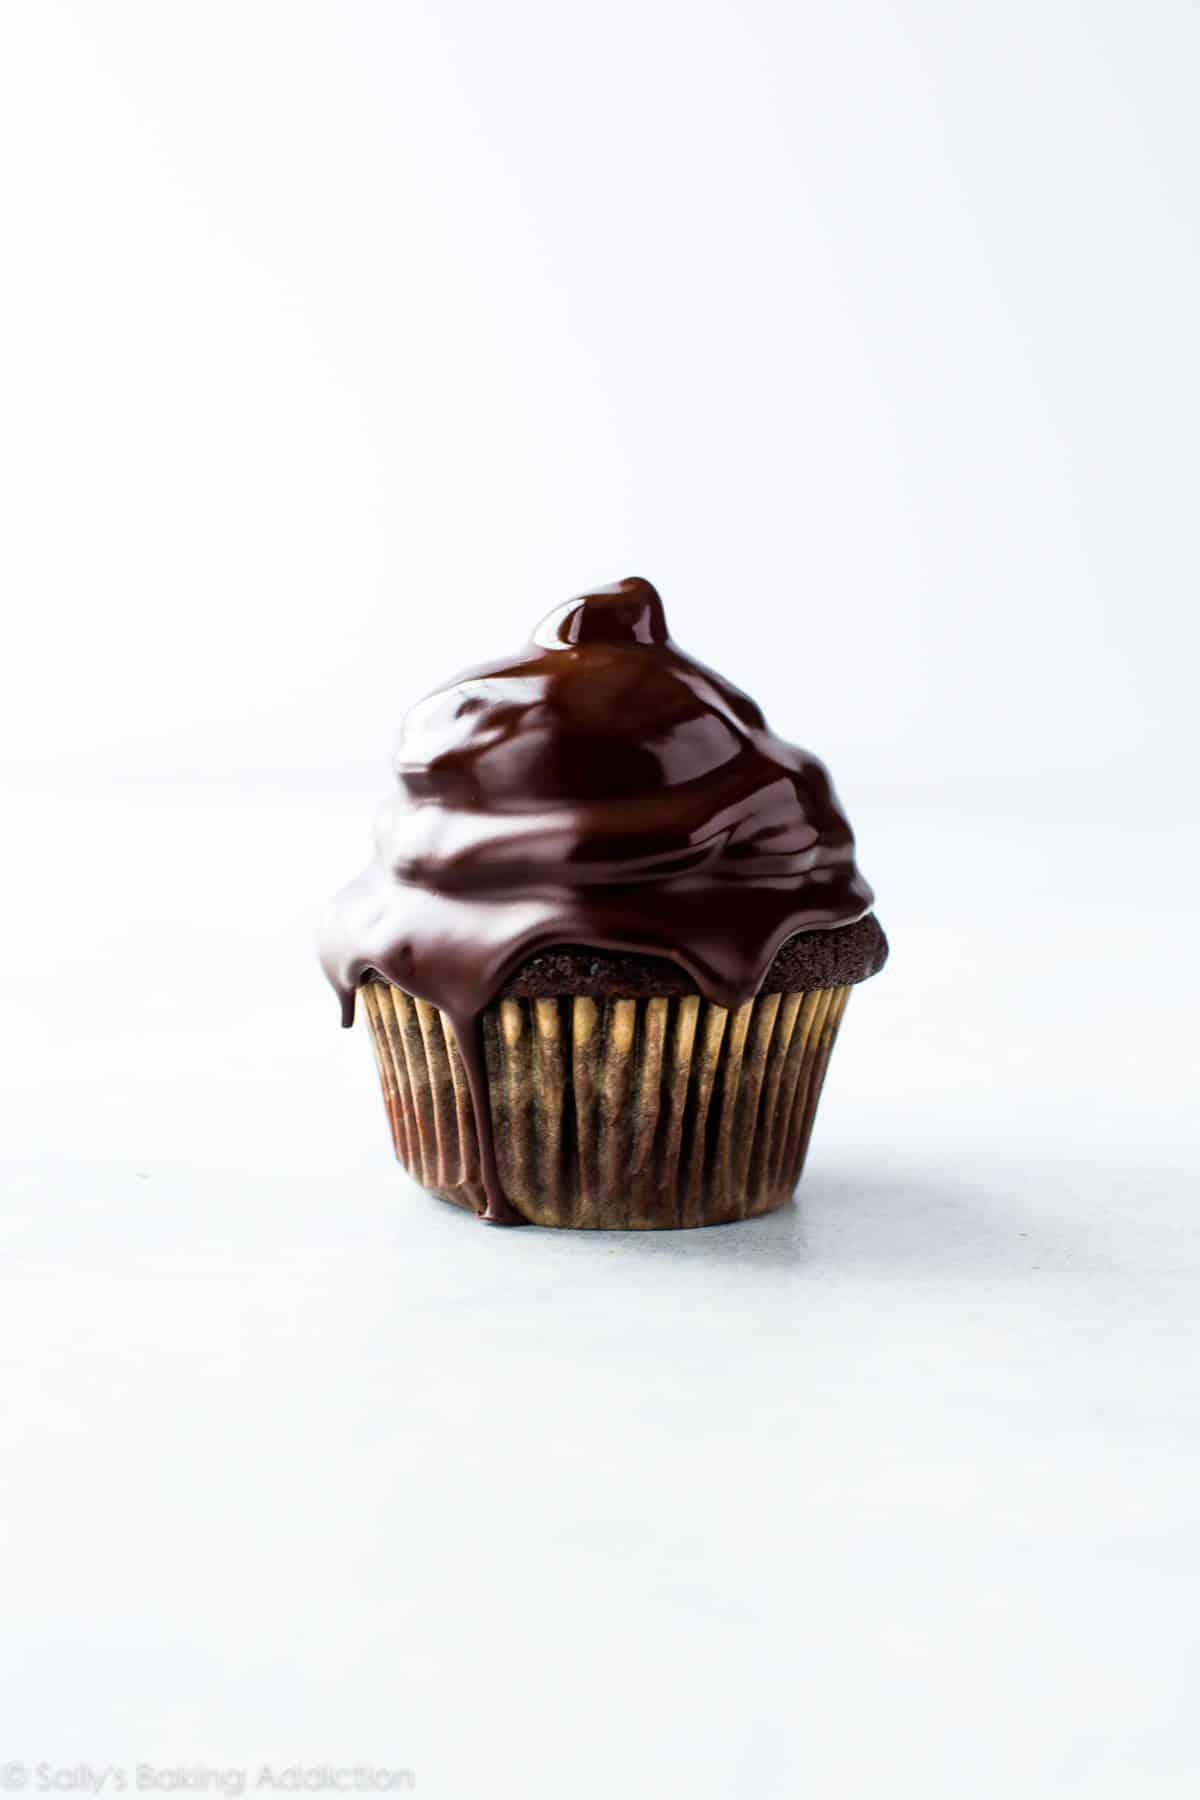 Peanut Butter Hi-Hat Cupcakes - Sallys Baking Addiction